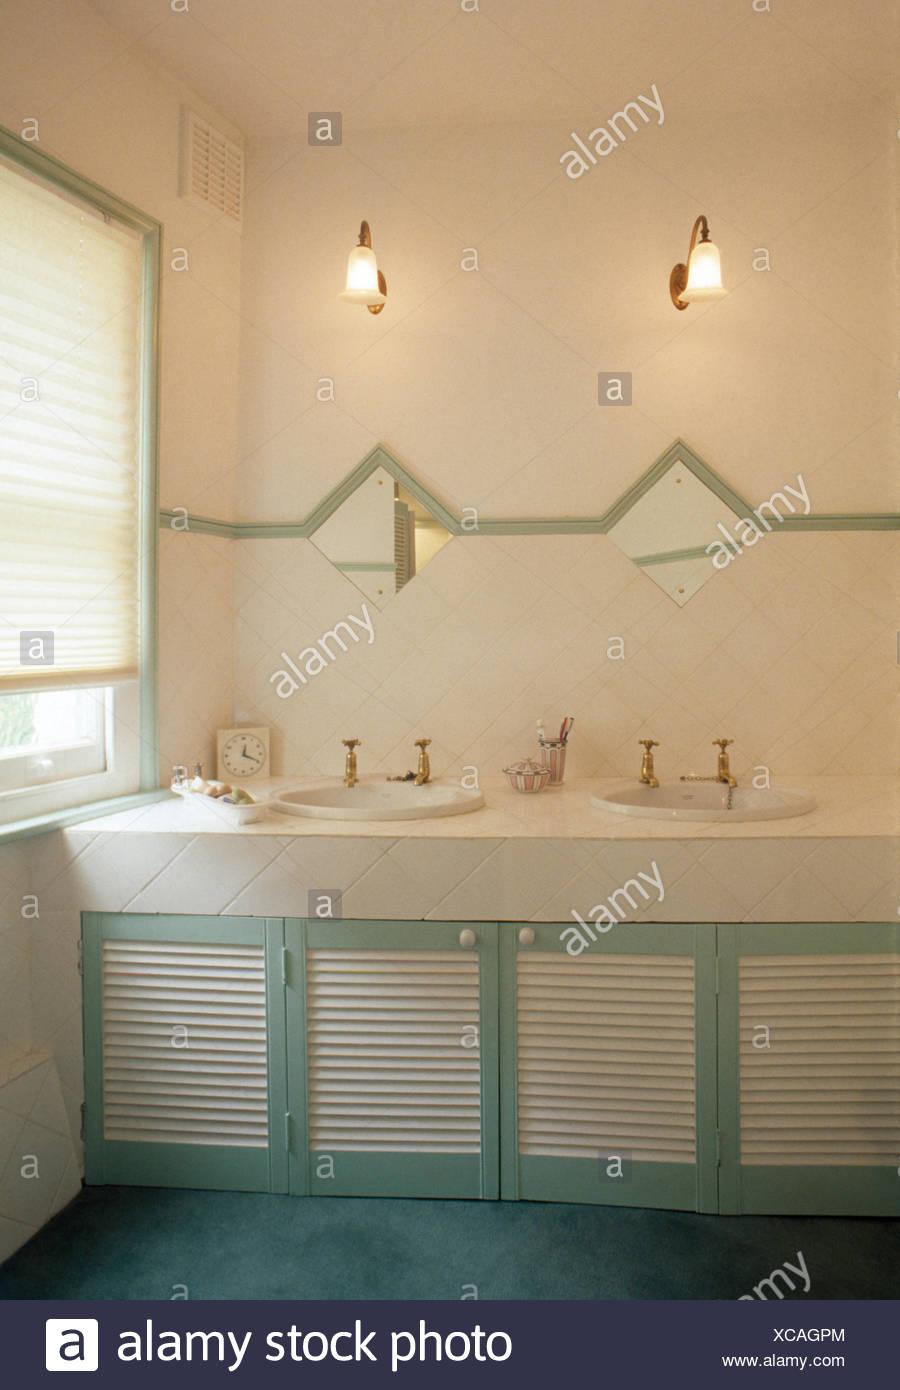 louvre doors on vanity unit with double basins in seventies bathroom stock image